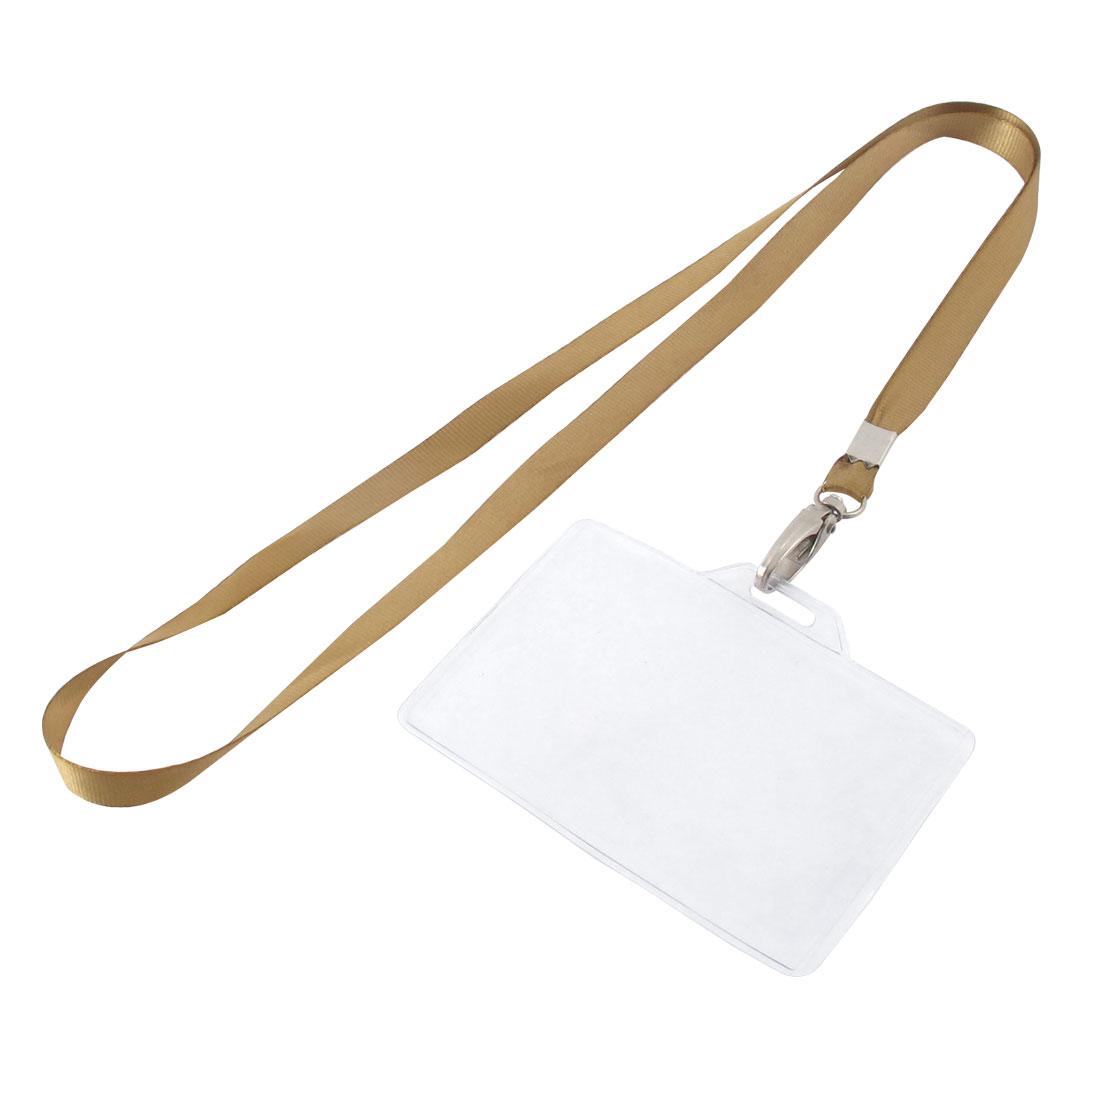 Lanyard Plastic Horizontal ID Name Employee Badge Card Holder Brown Clear